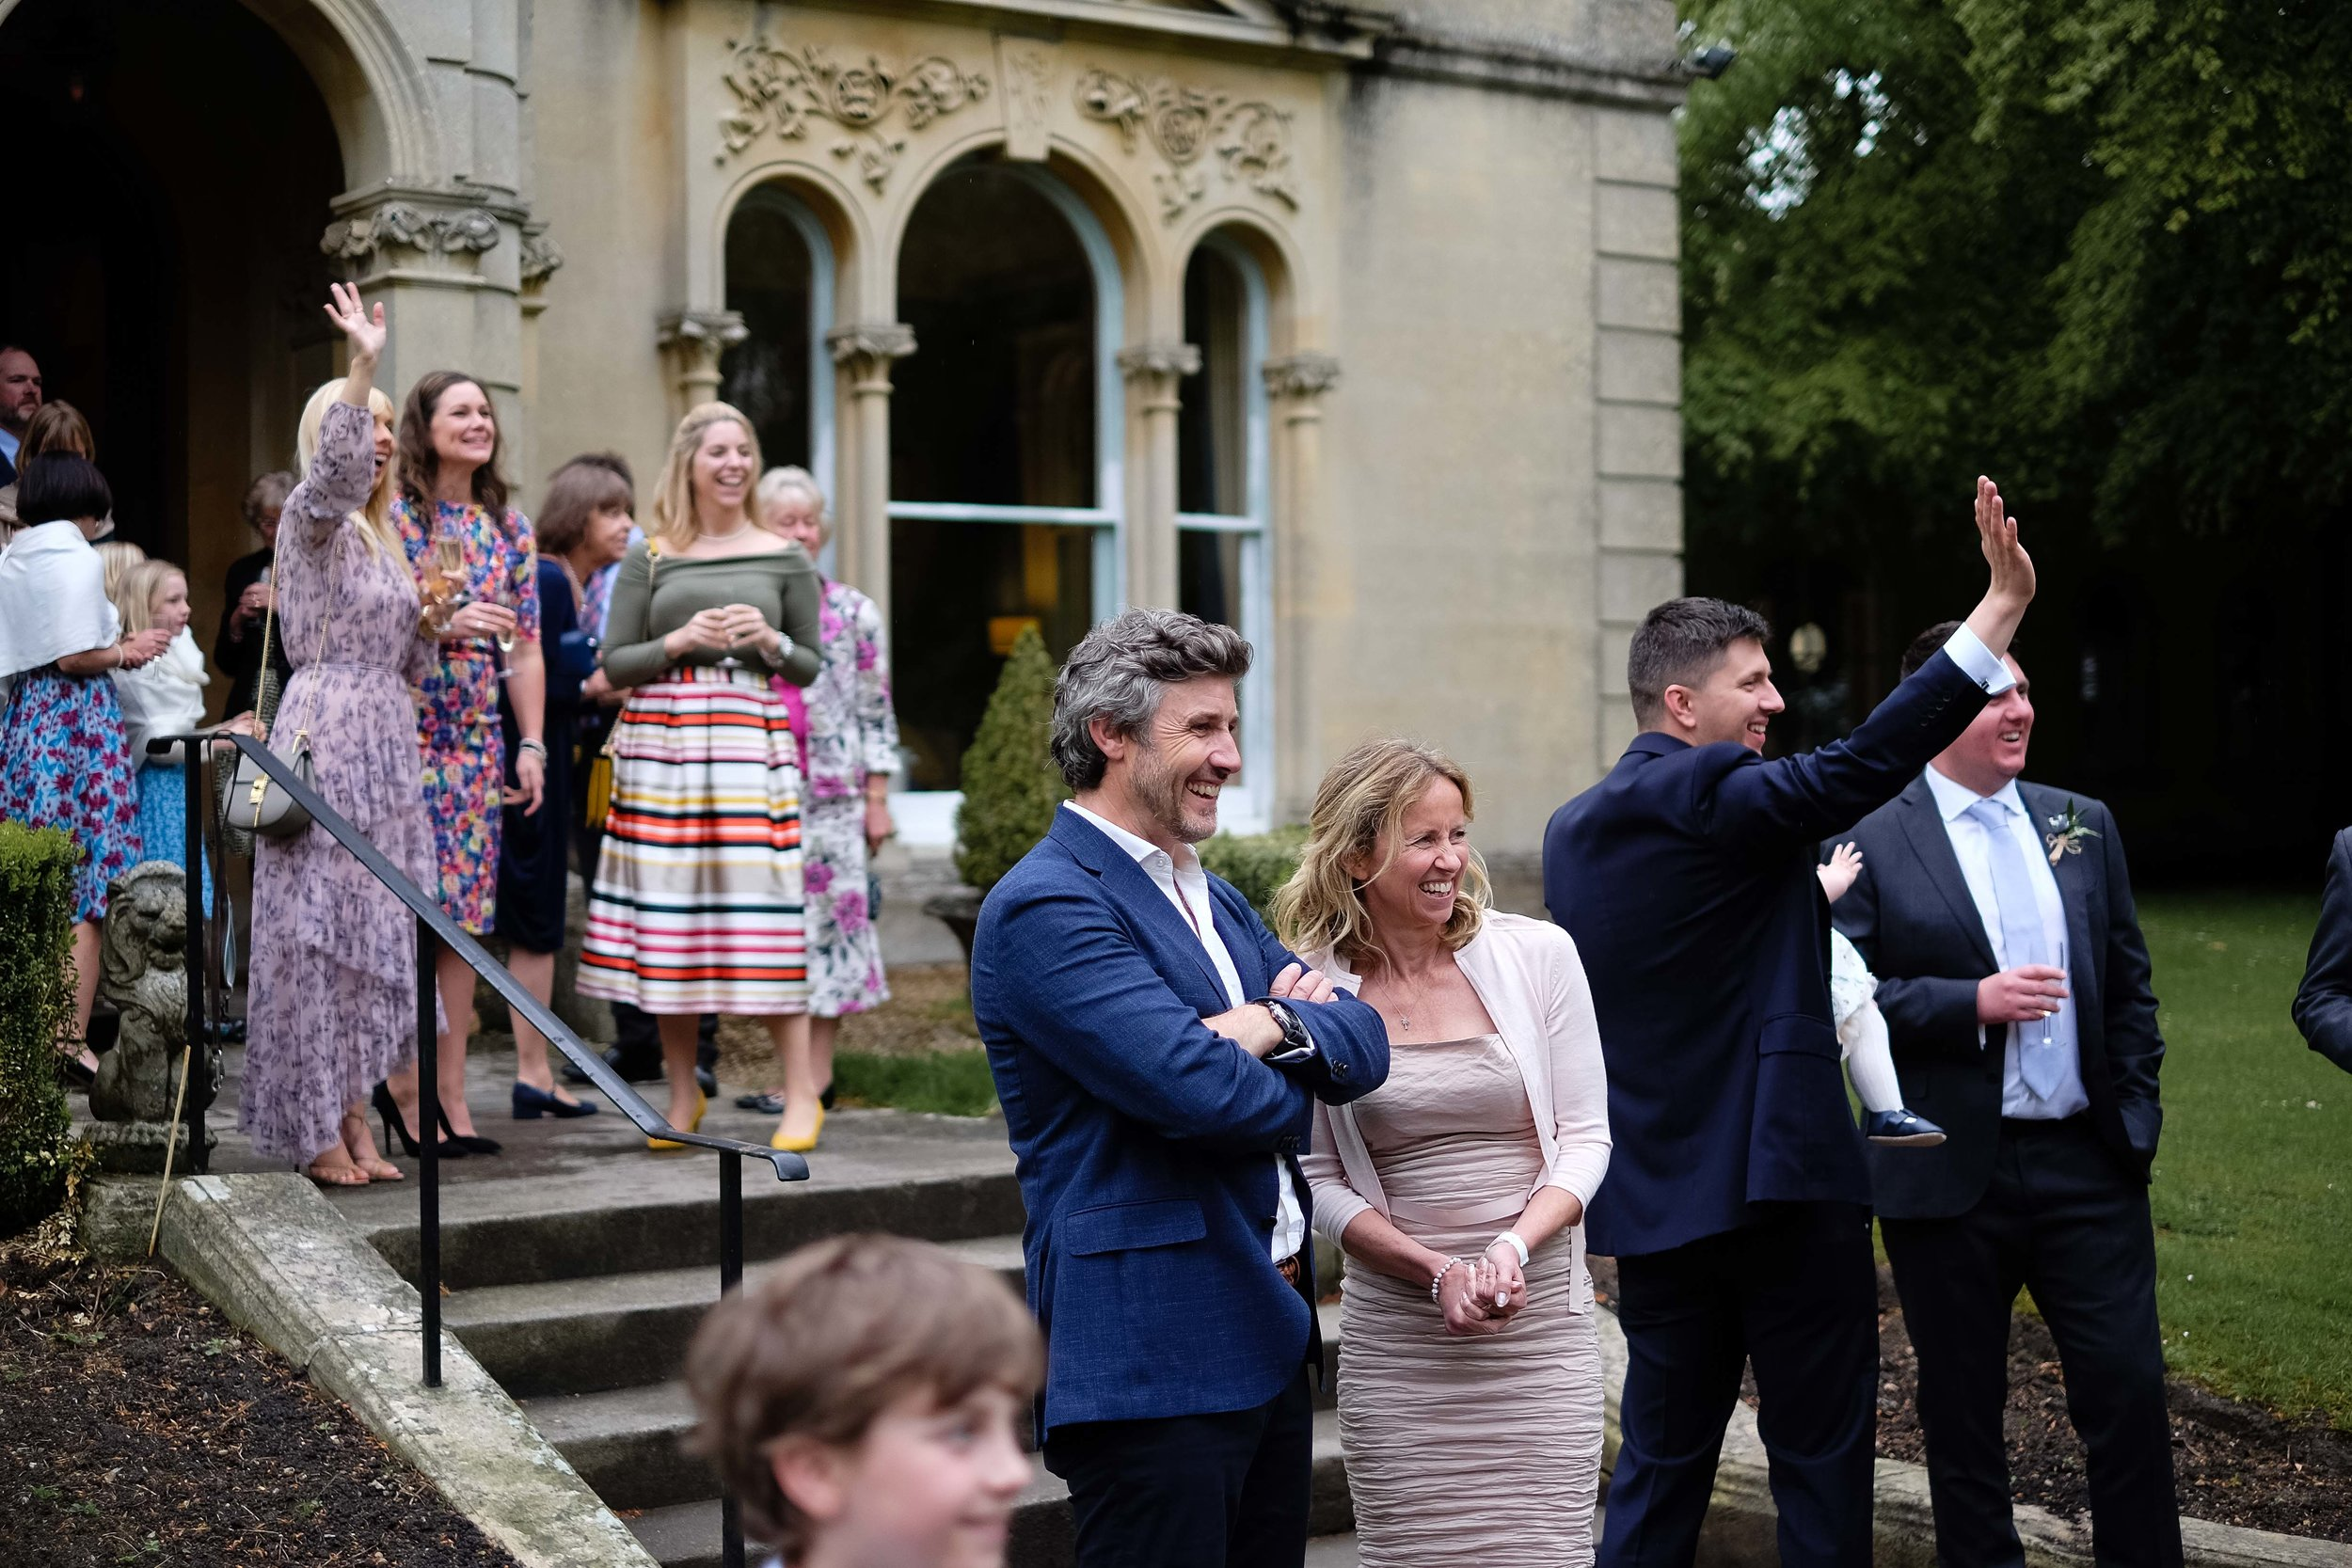 Beechfield house weddings - Abby and Greg (144 of 208).jpg